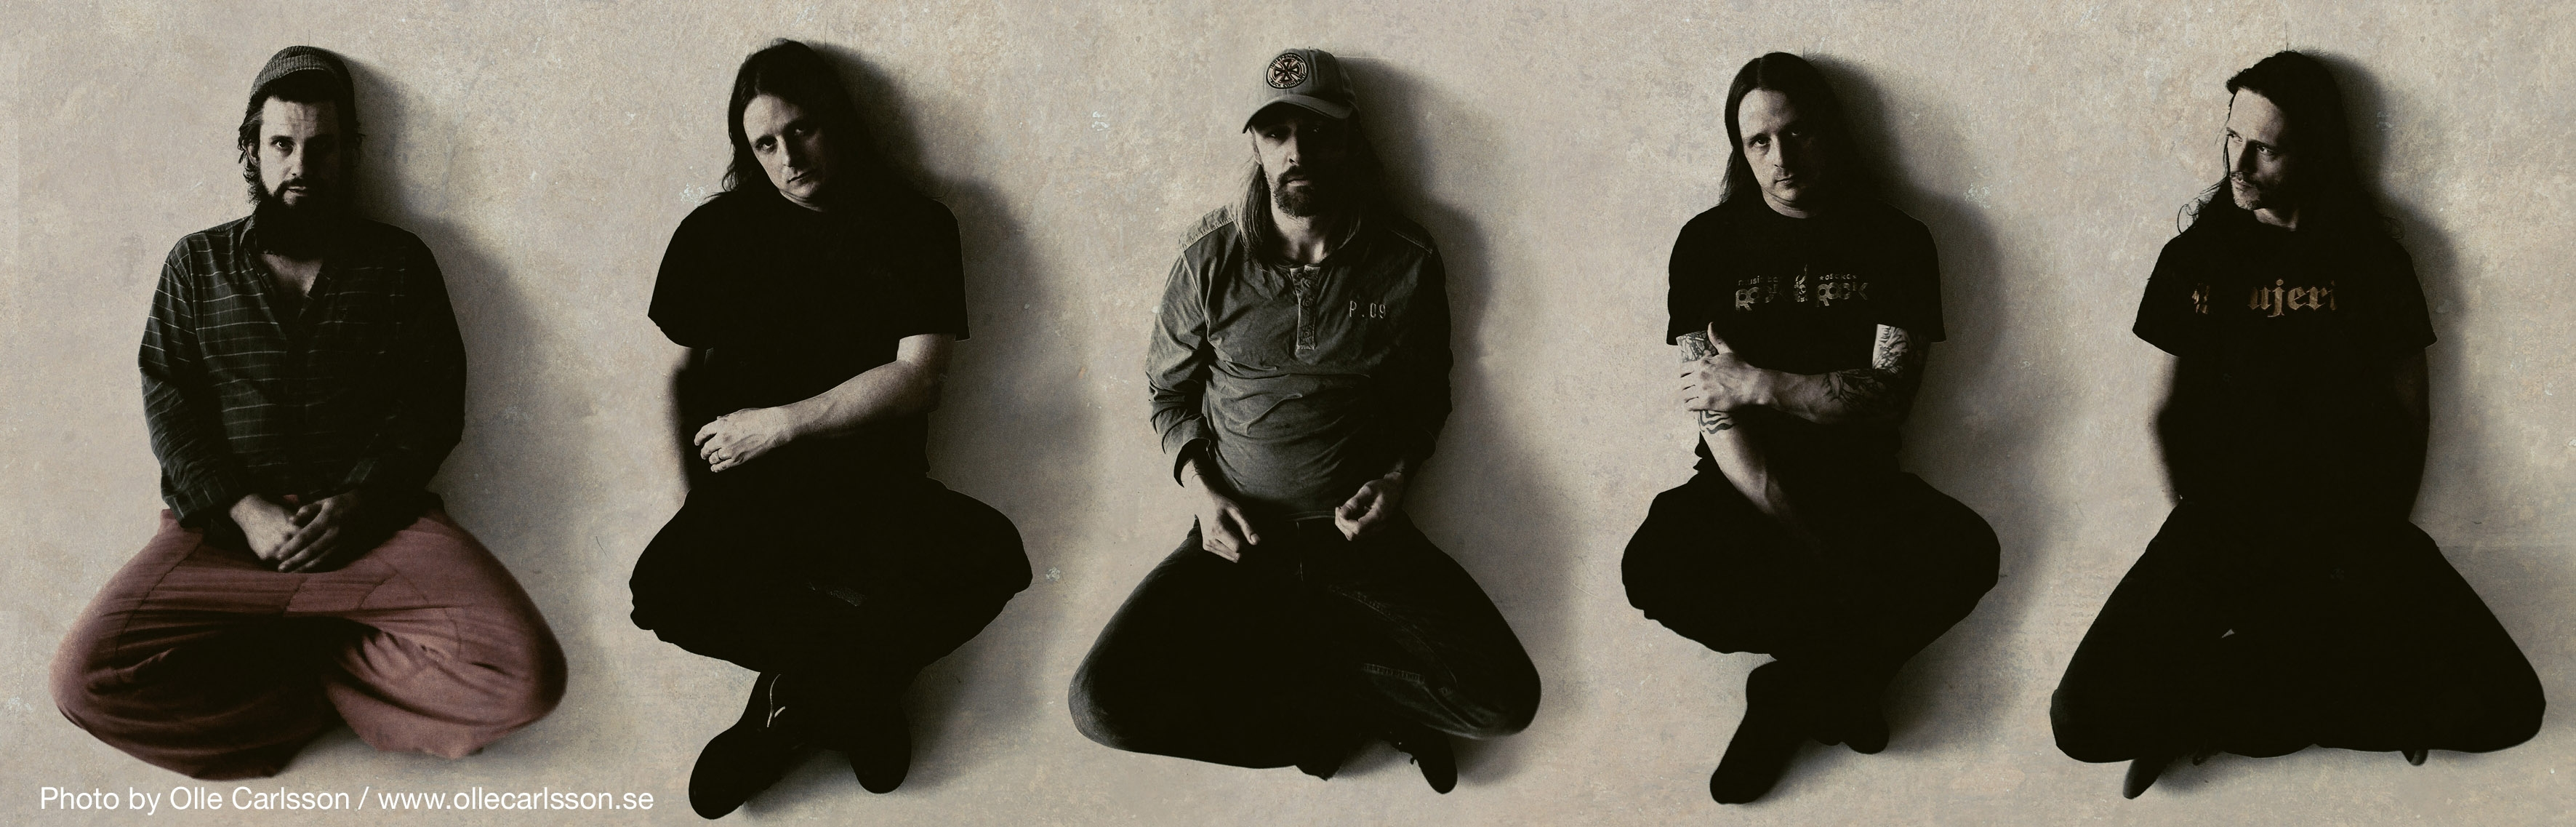 TheHauntedband2011.JPG